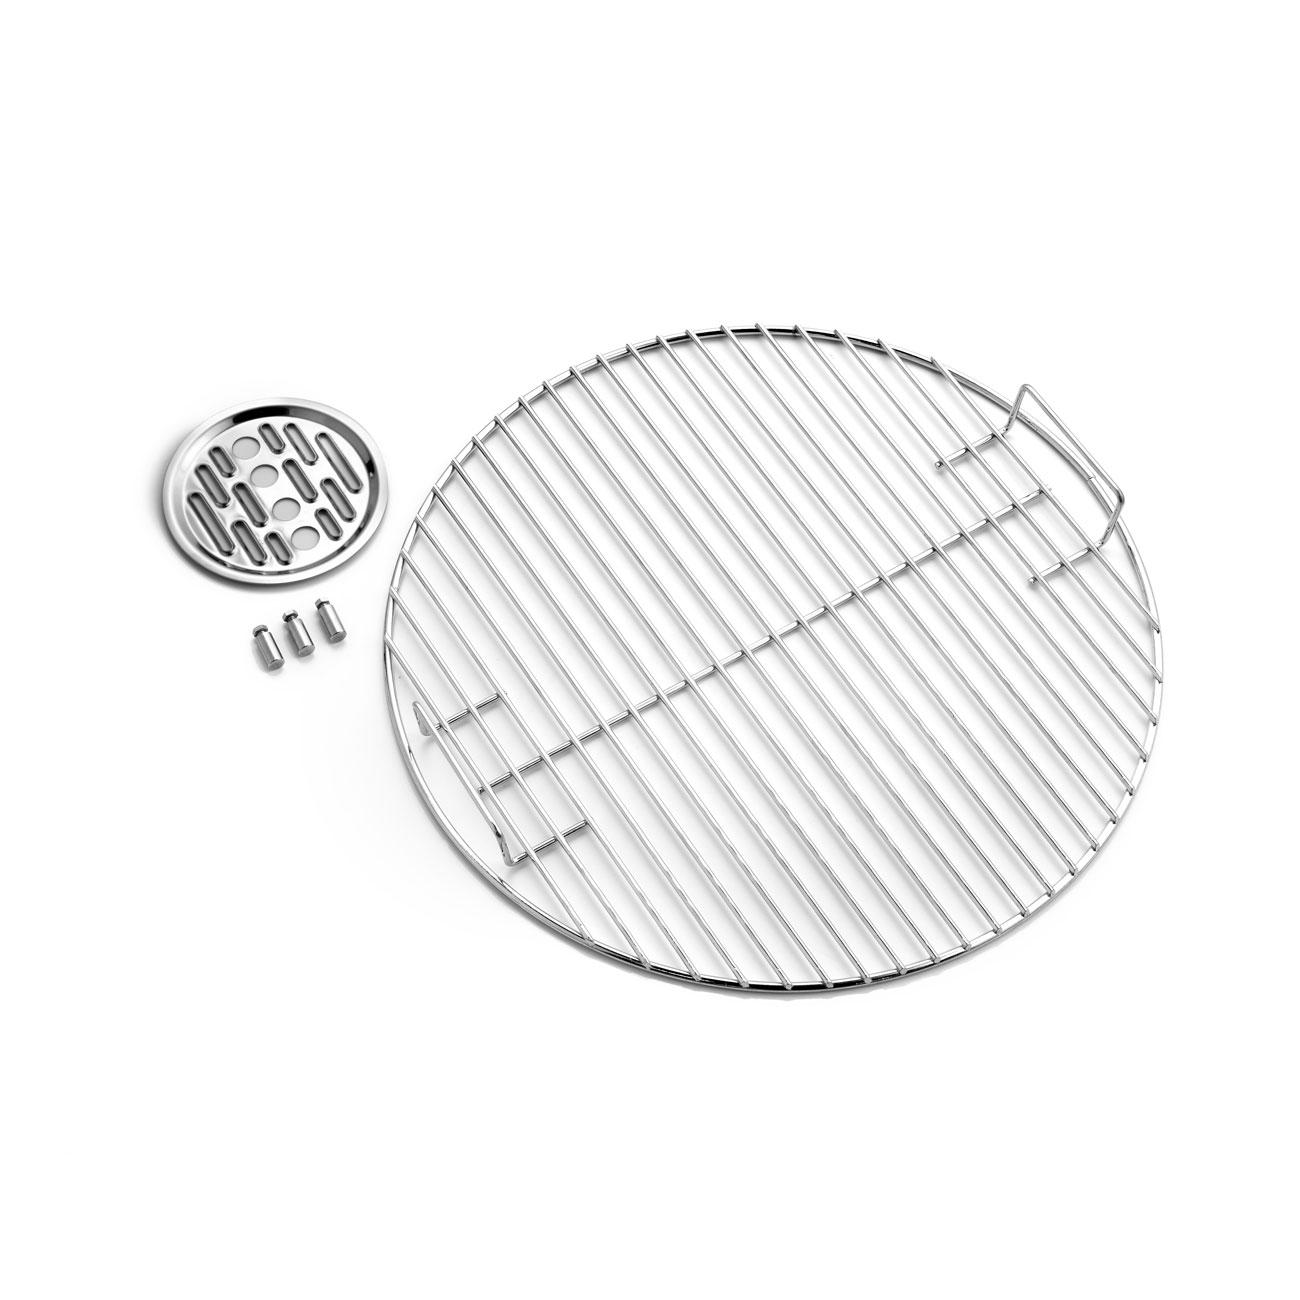 Image of Ompagrill kit traformazione pellet/carbonella